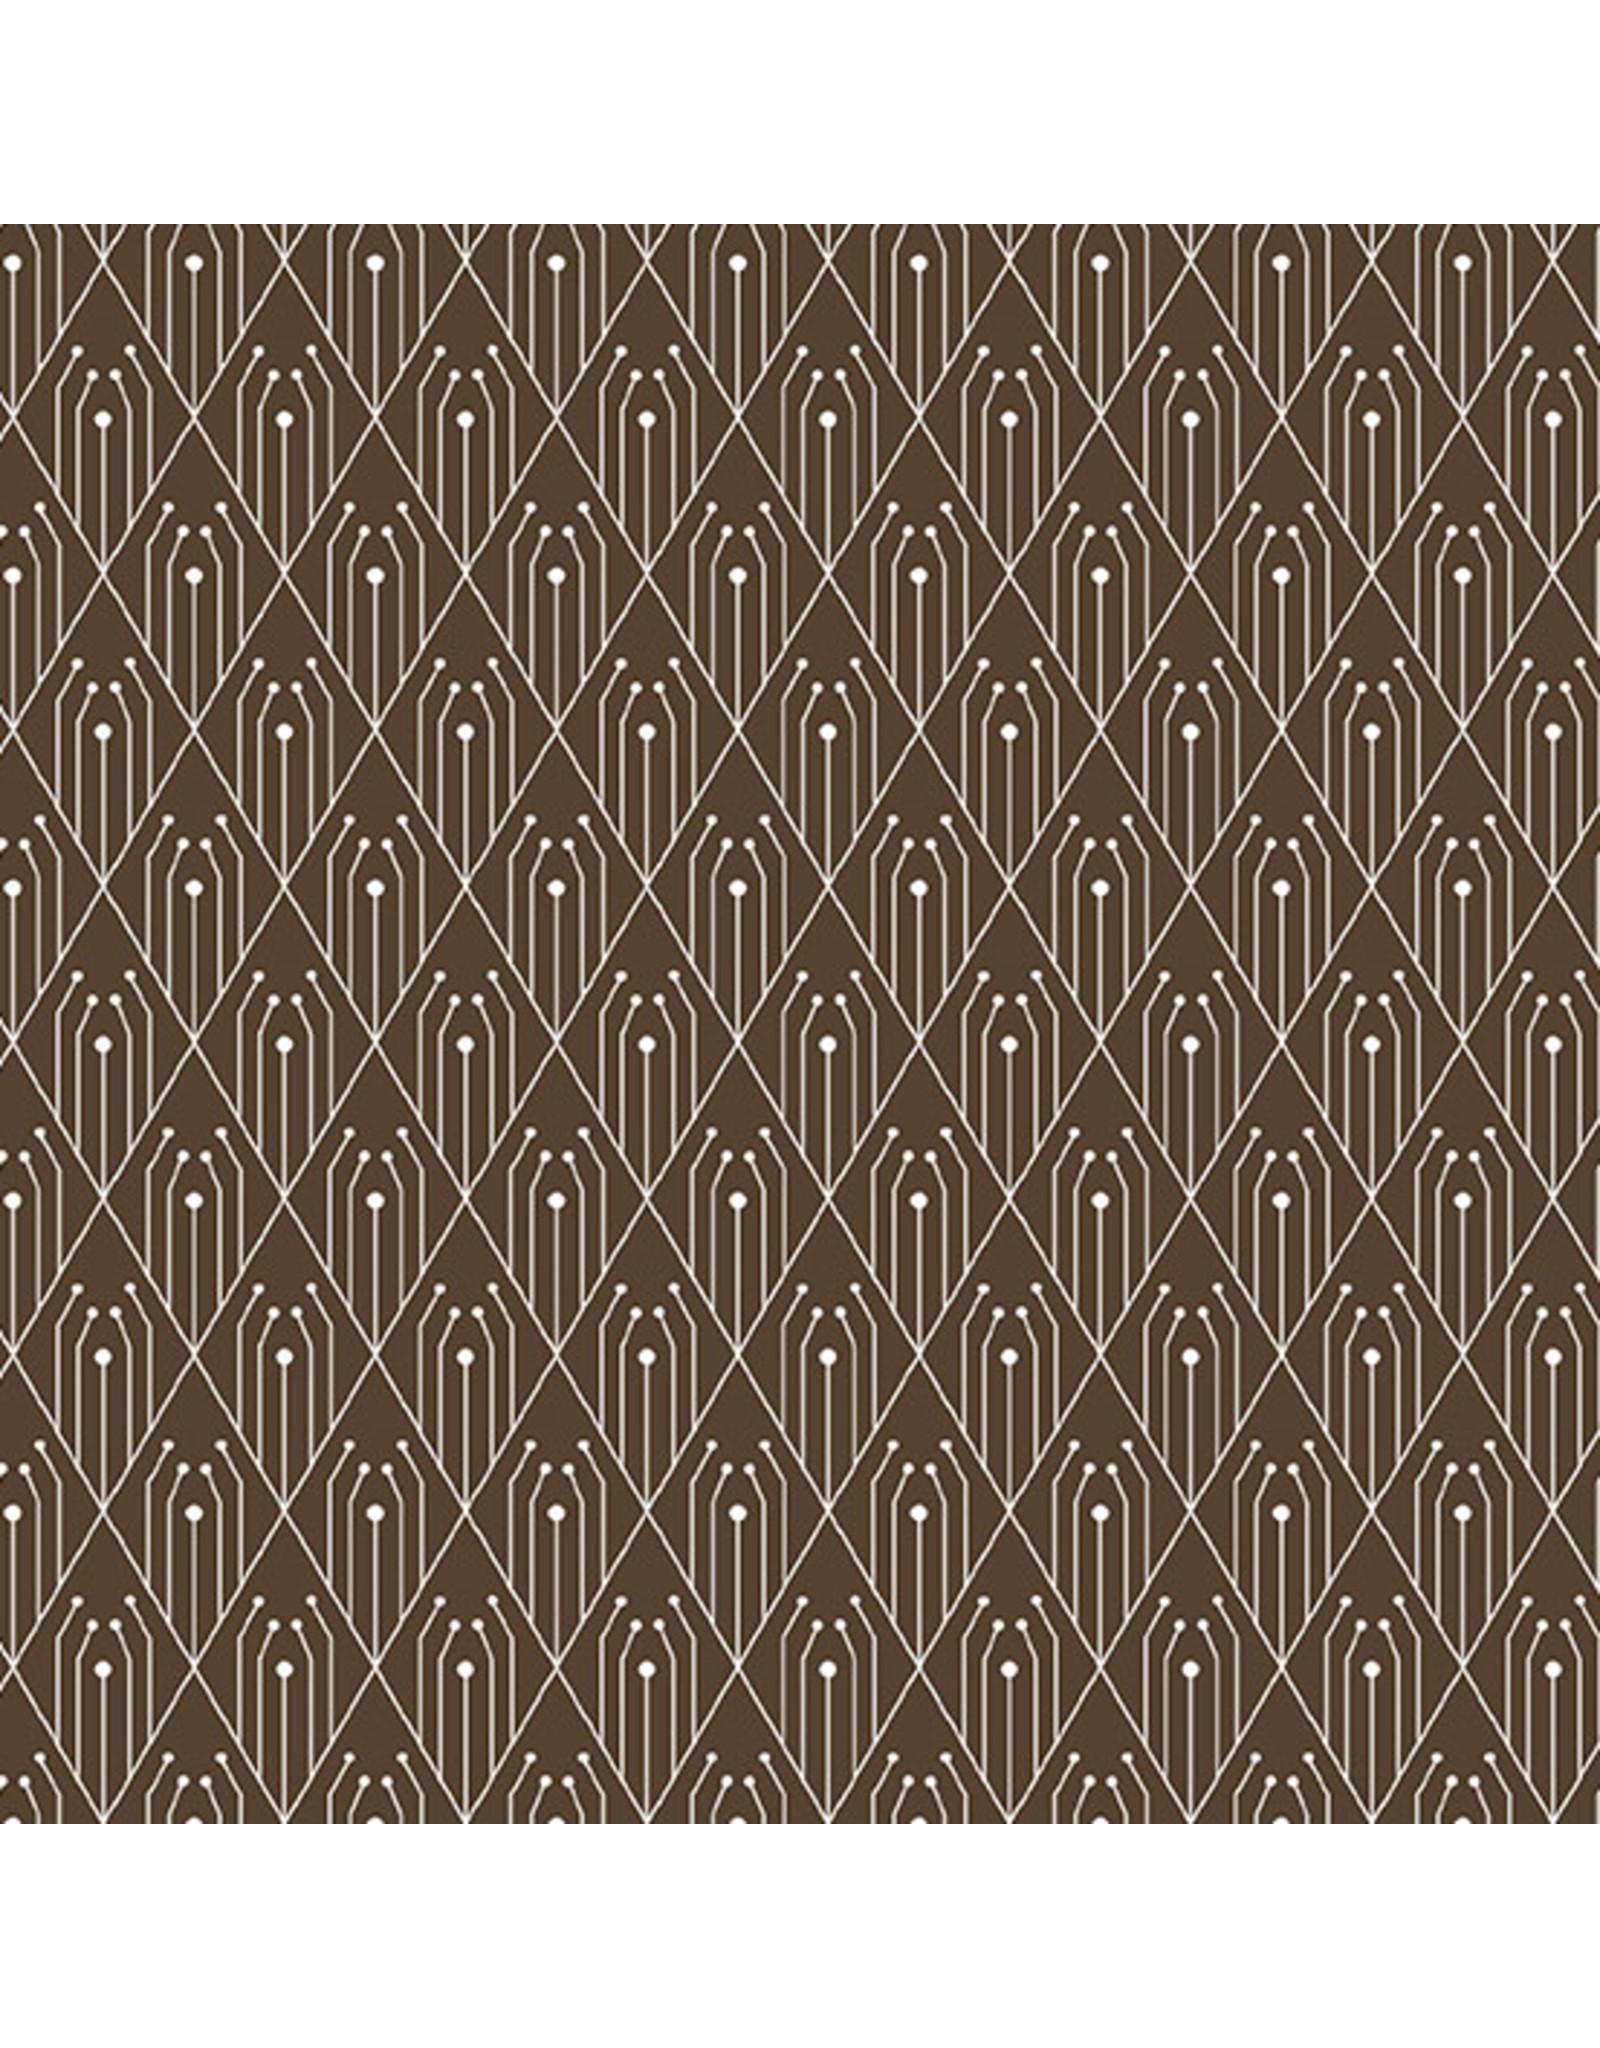 Giucy Giuce Century Prints, Deco Diamonds in Chocolate, Fabric Half-Yards